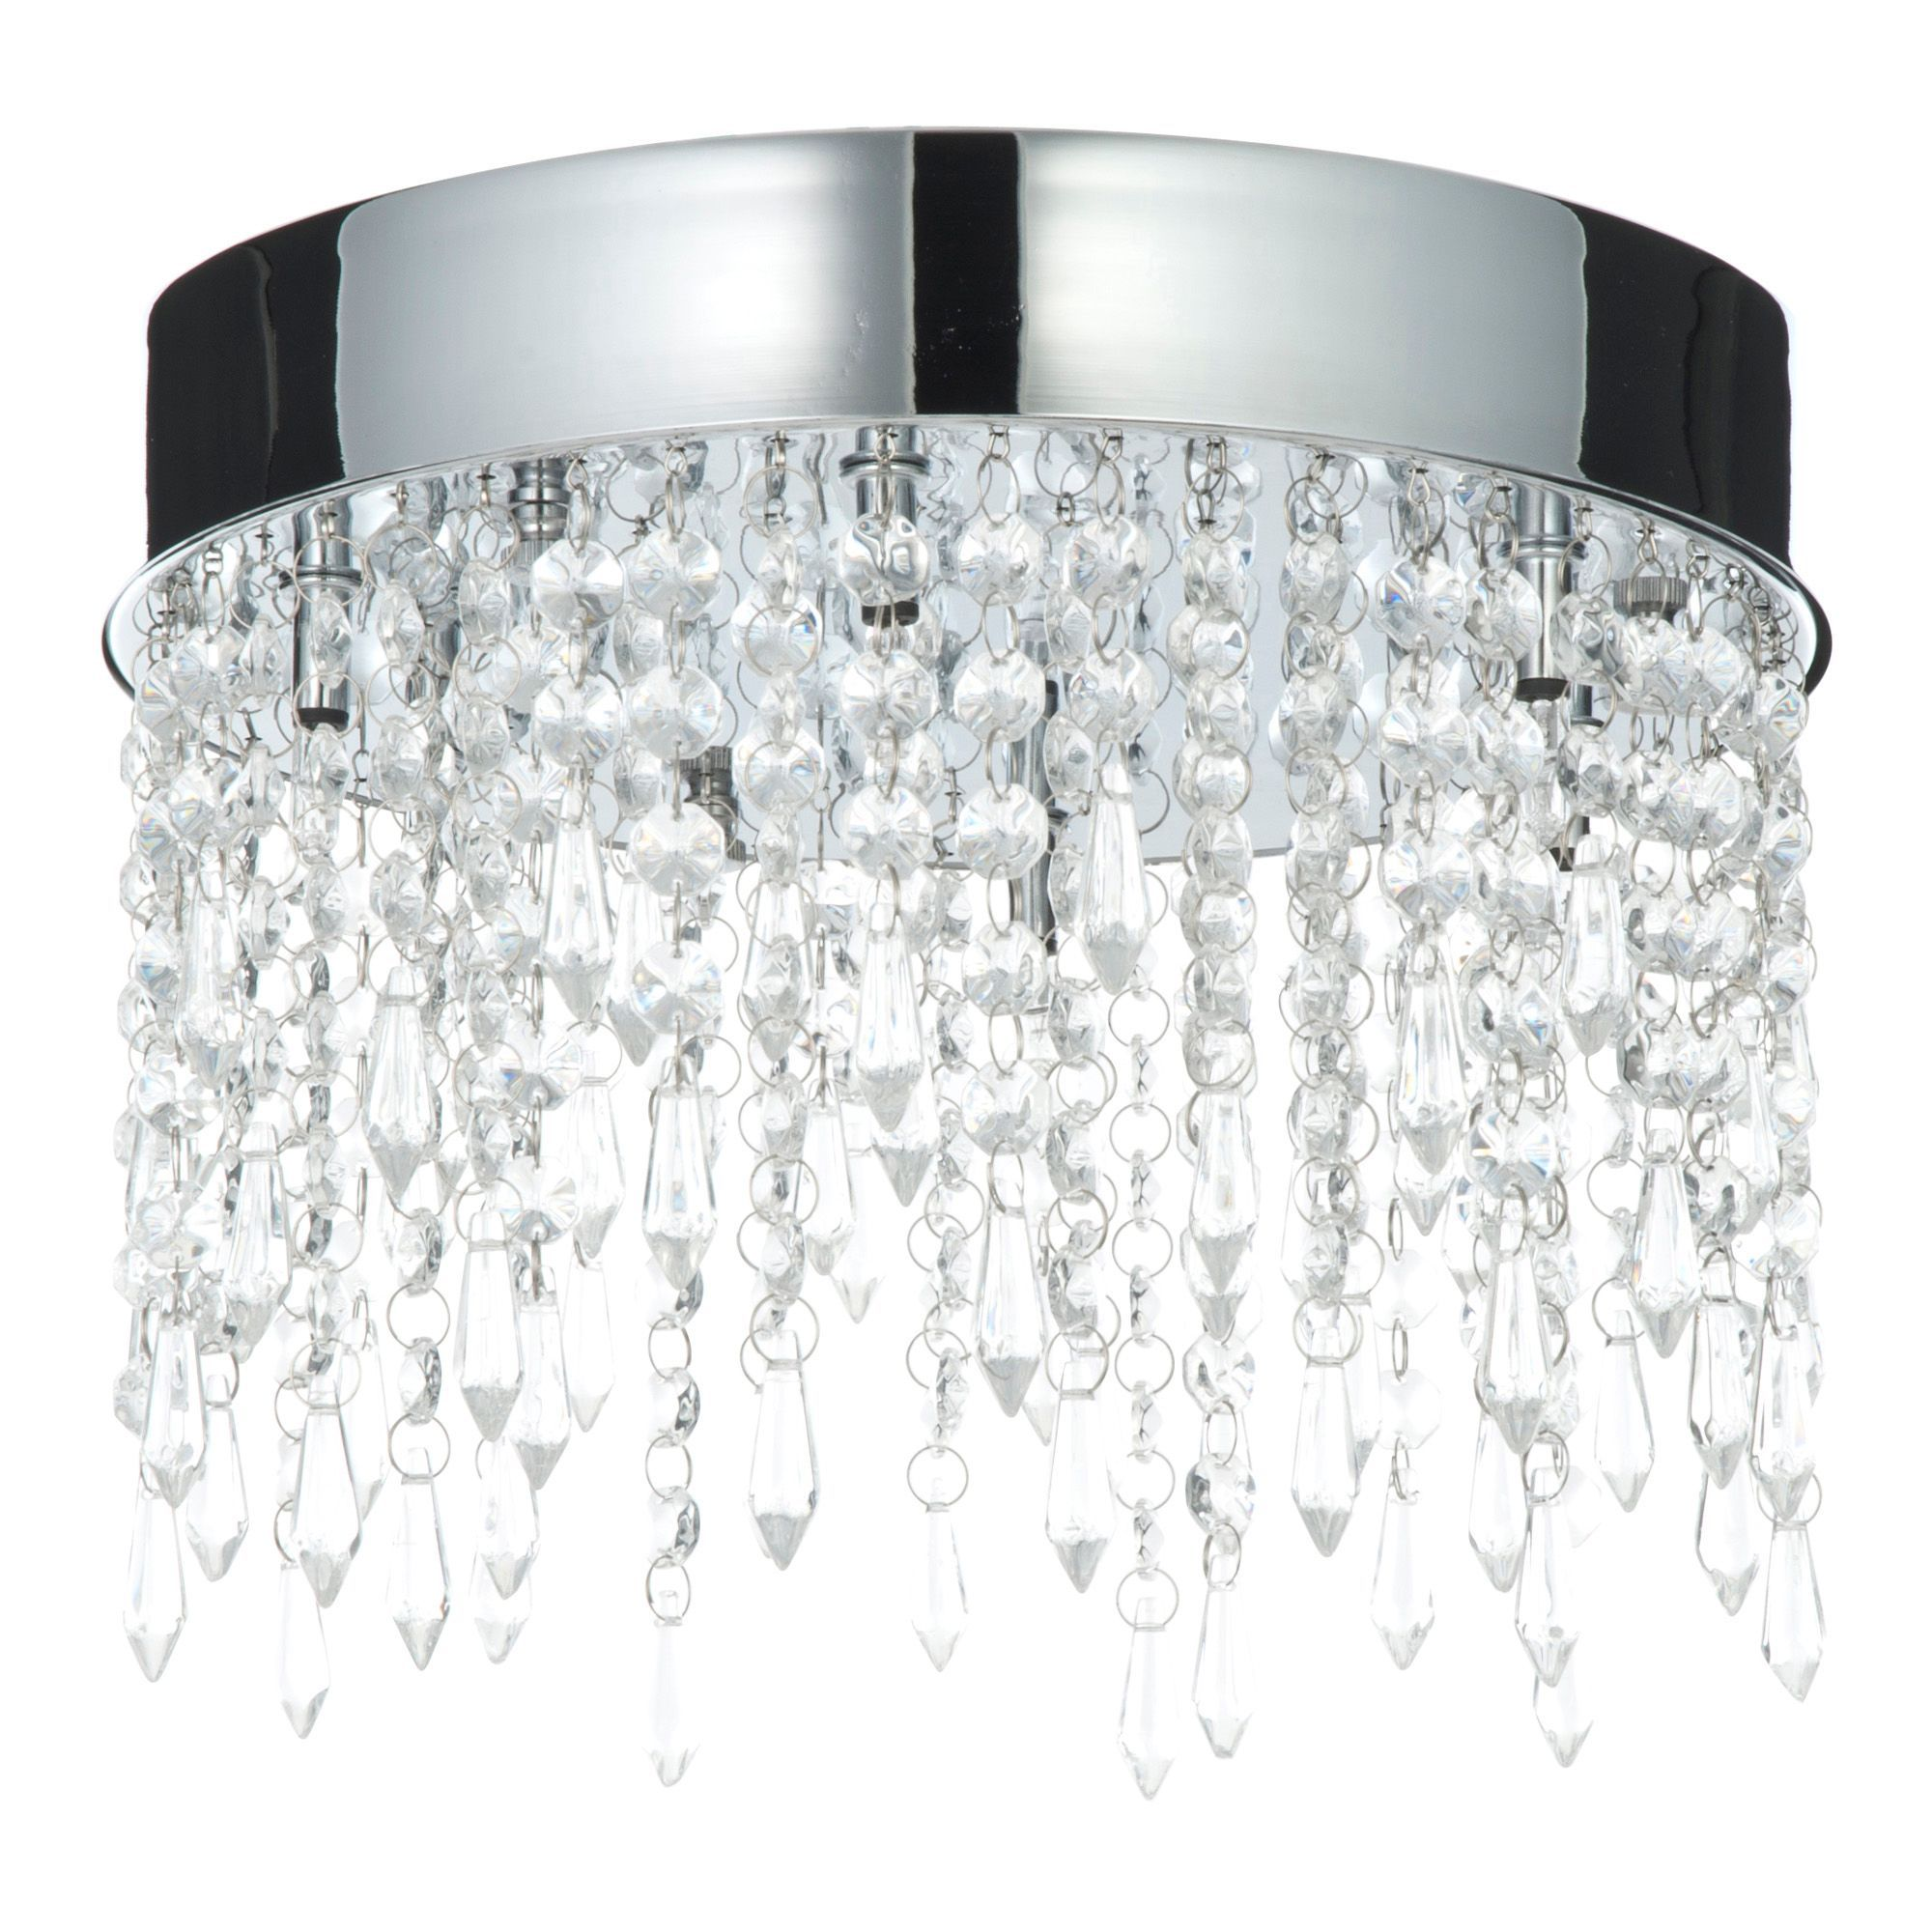 Sabine Crystal Droplets Clear 6 Lamp Flush Ceiling Light ...